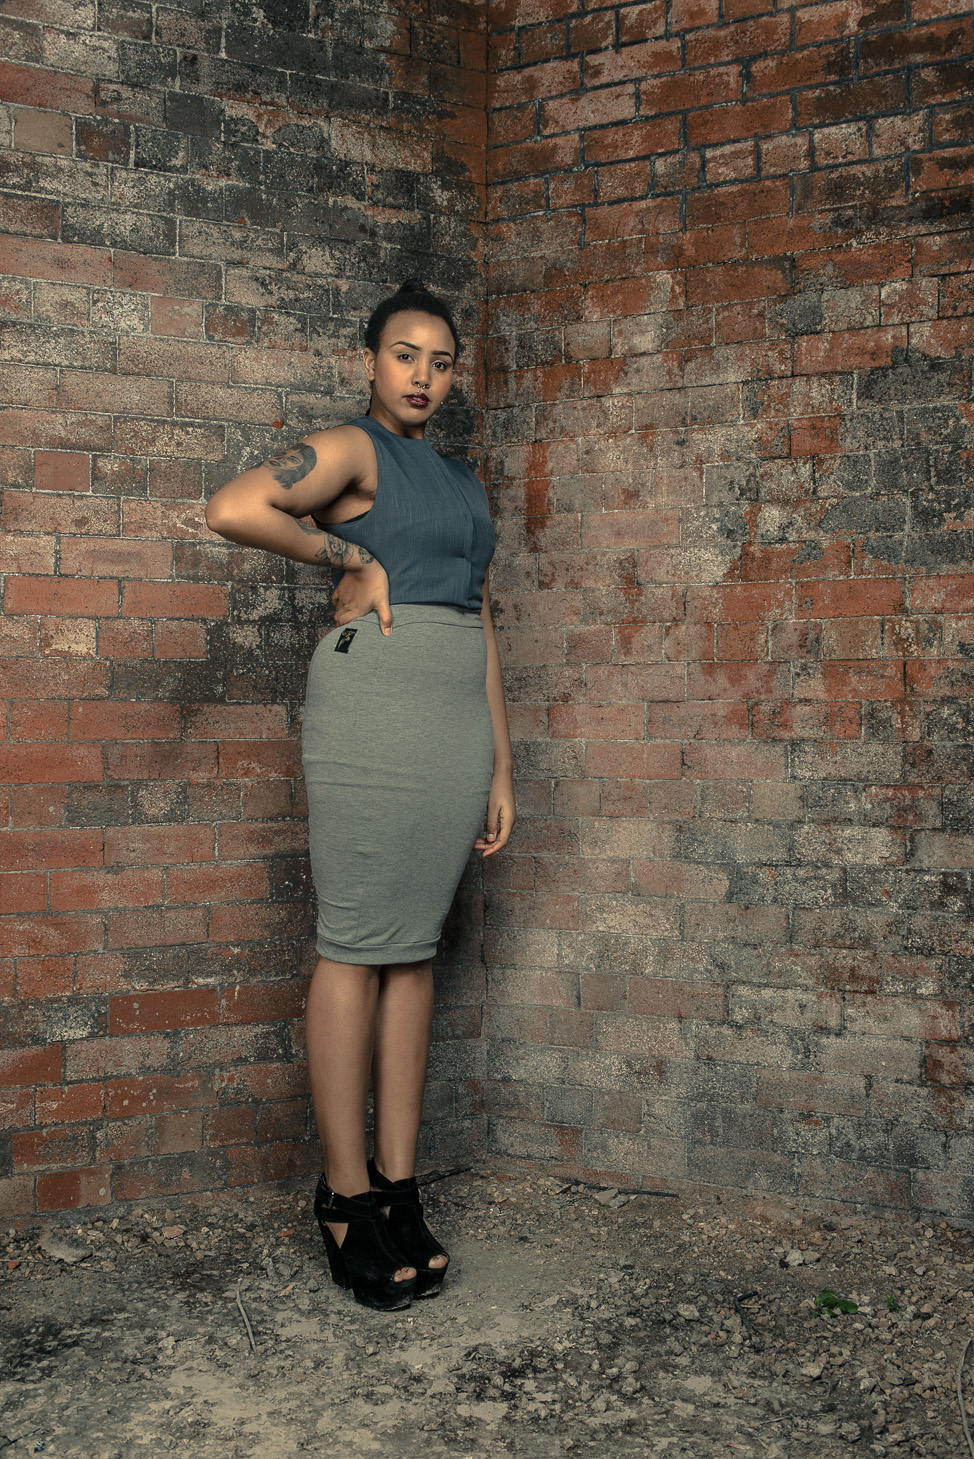 zaramia-ava-zaramiaava-leeds-fashion-designer-ethical-sustainable-tailored-minimalist-skirt-bandeau-maxi-versatile-drape-grey-bodysuit-black-obi-belt-wrap-shirt-cowl-styling-womenswear-models-34